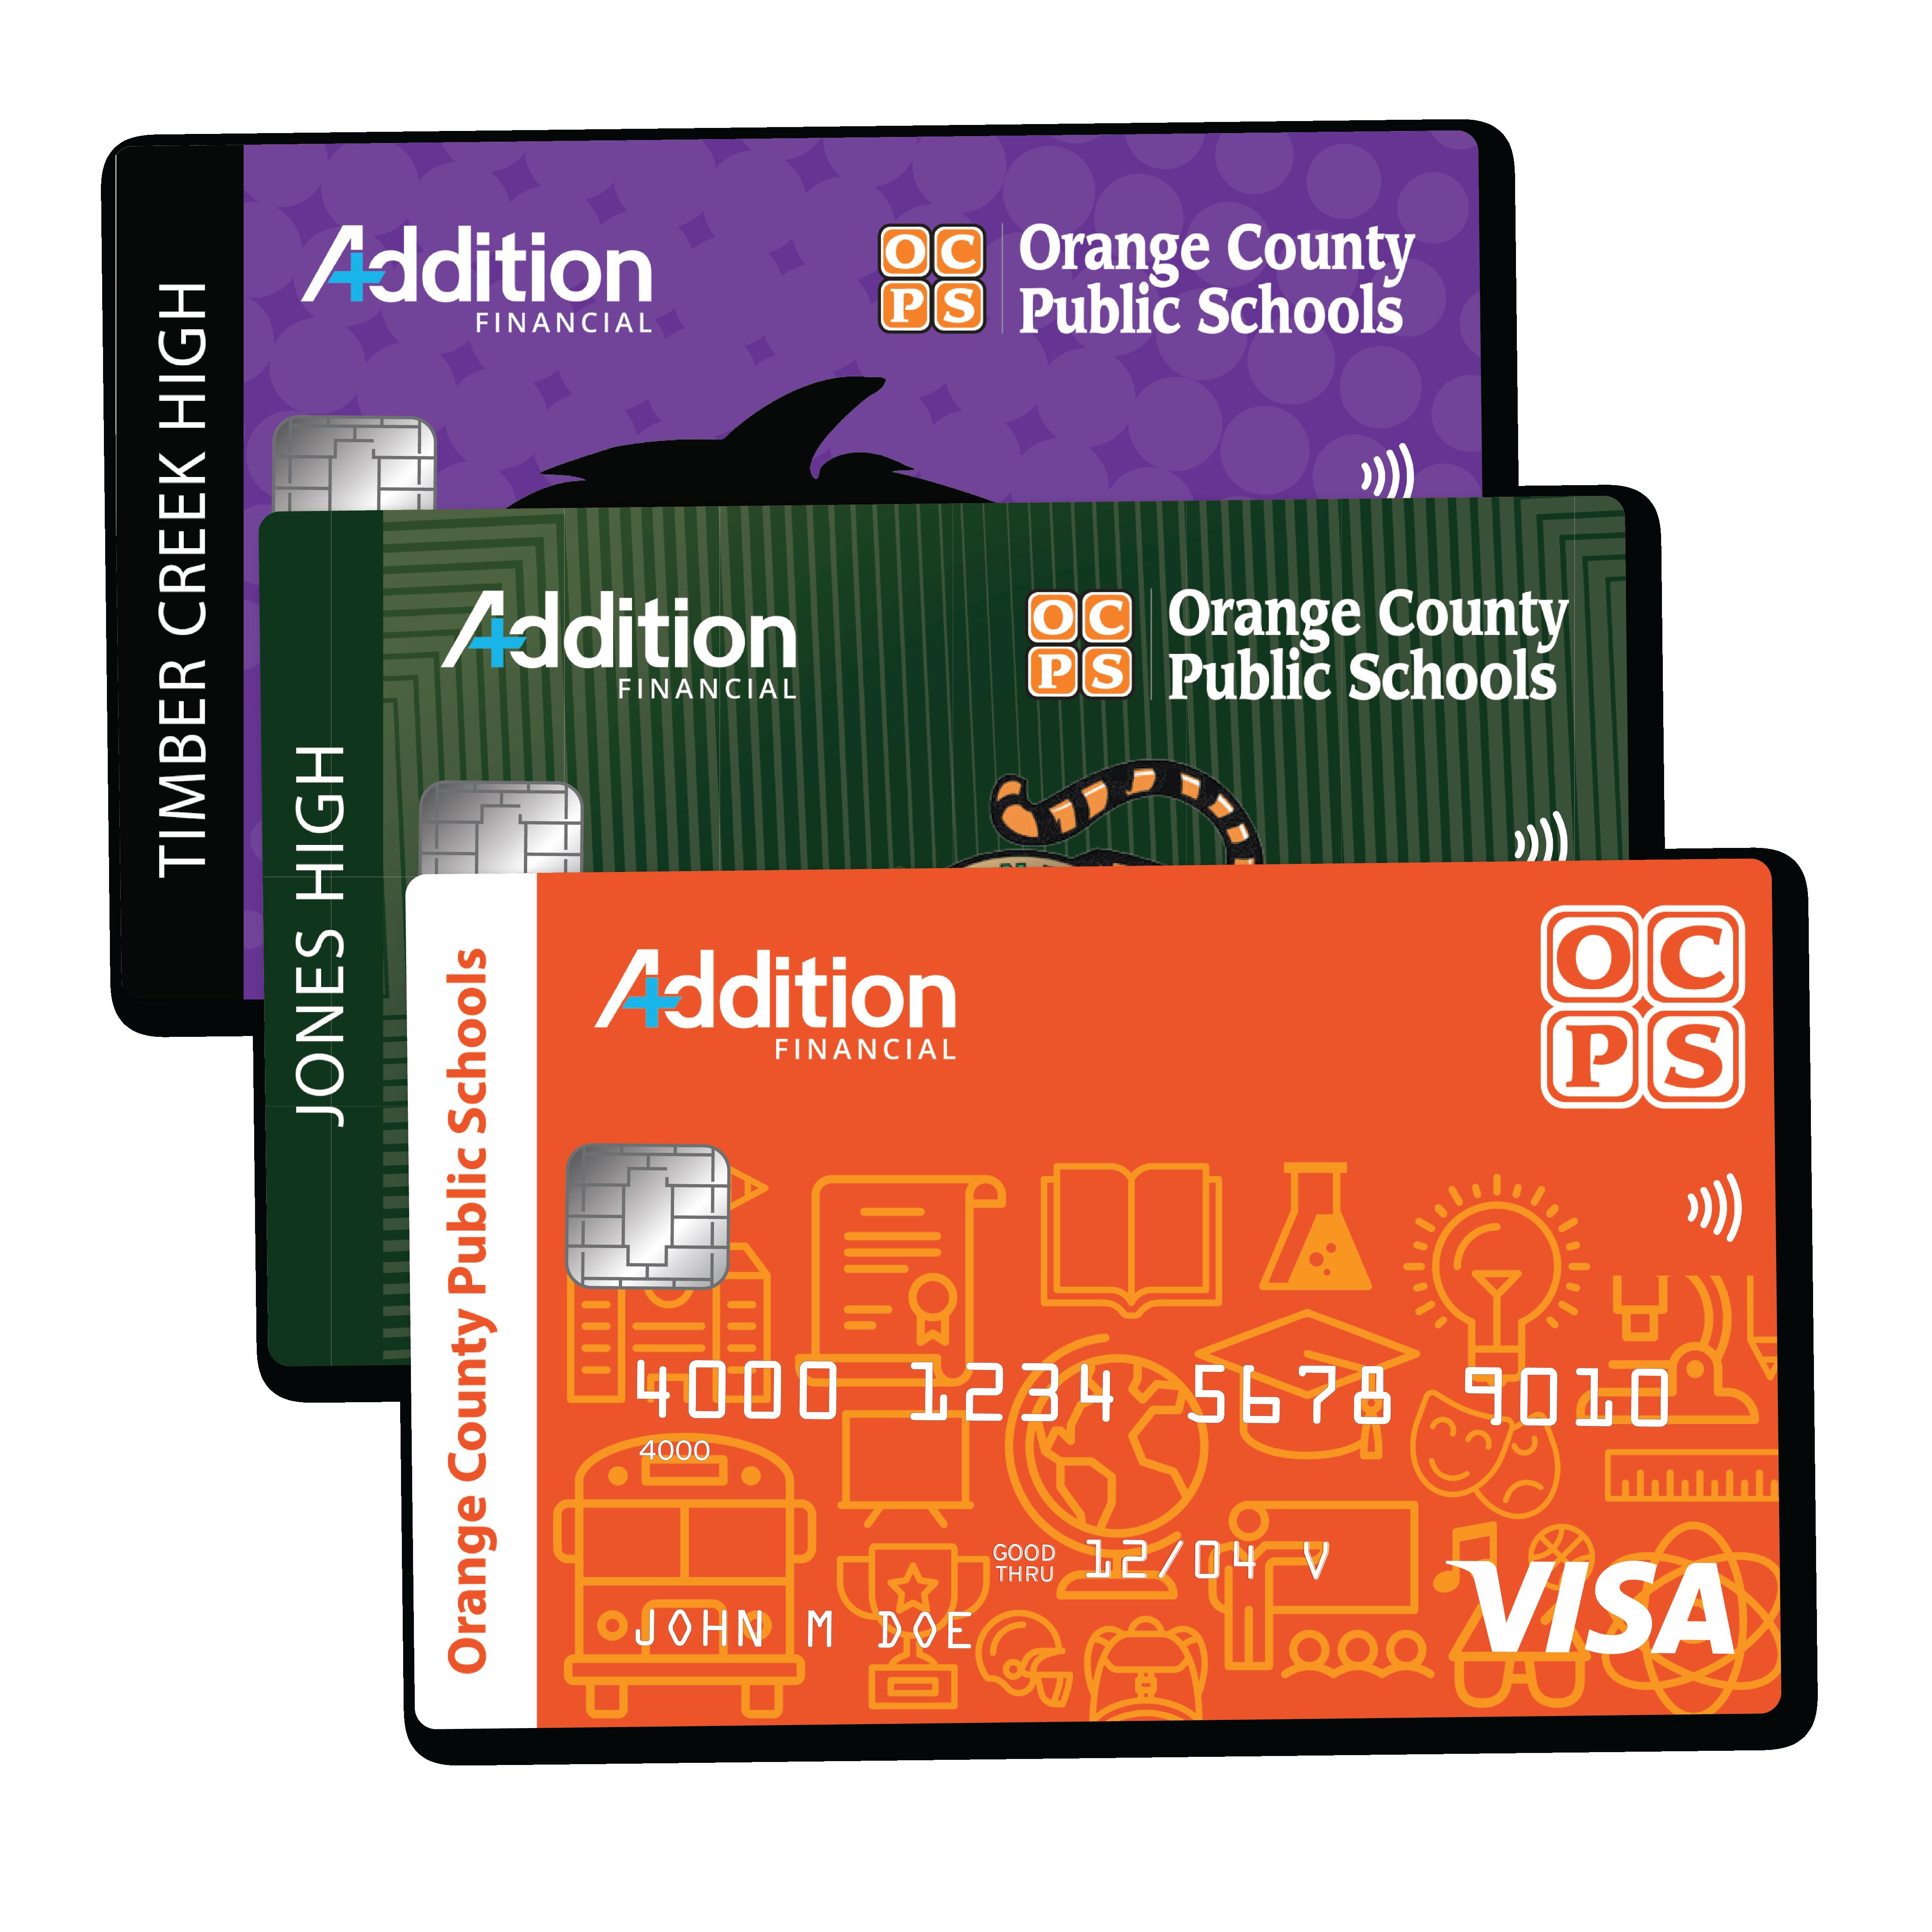 stacked debit cards_OCPS-01